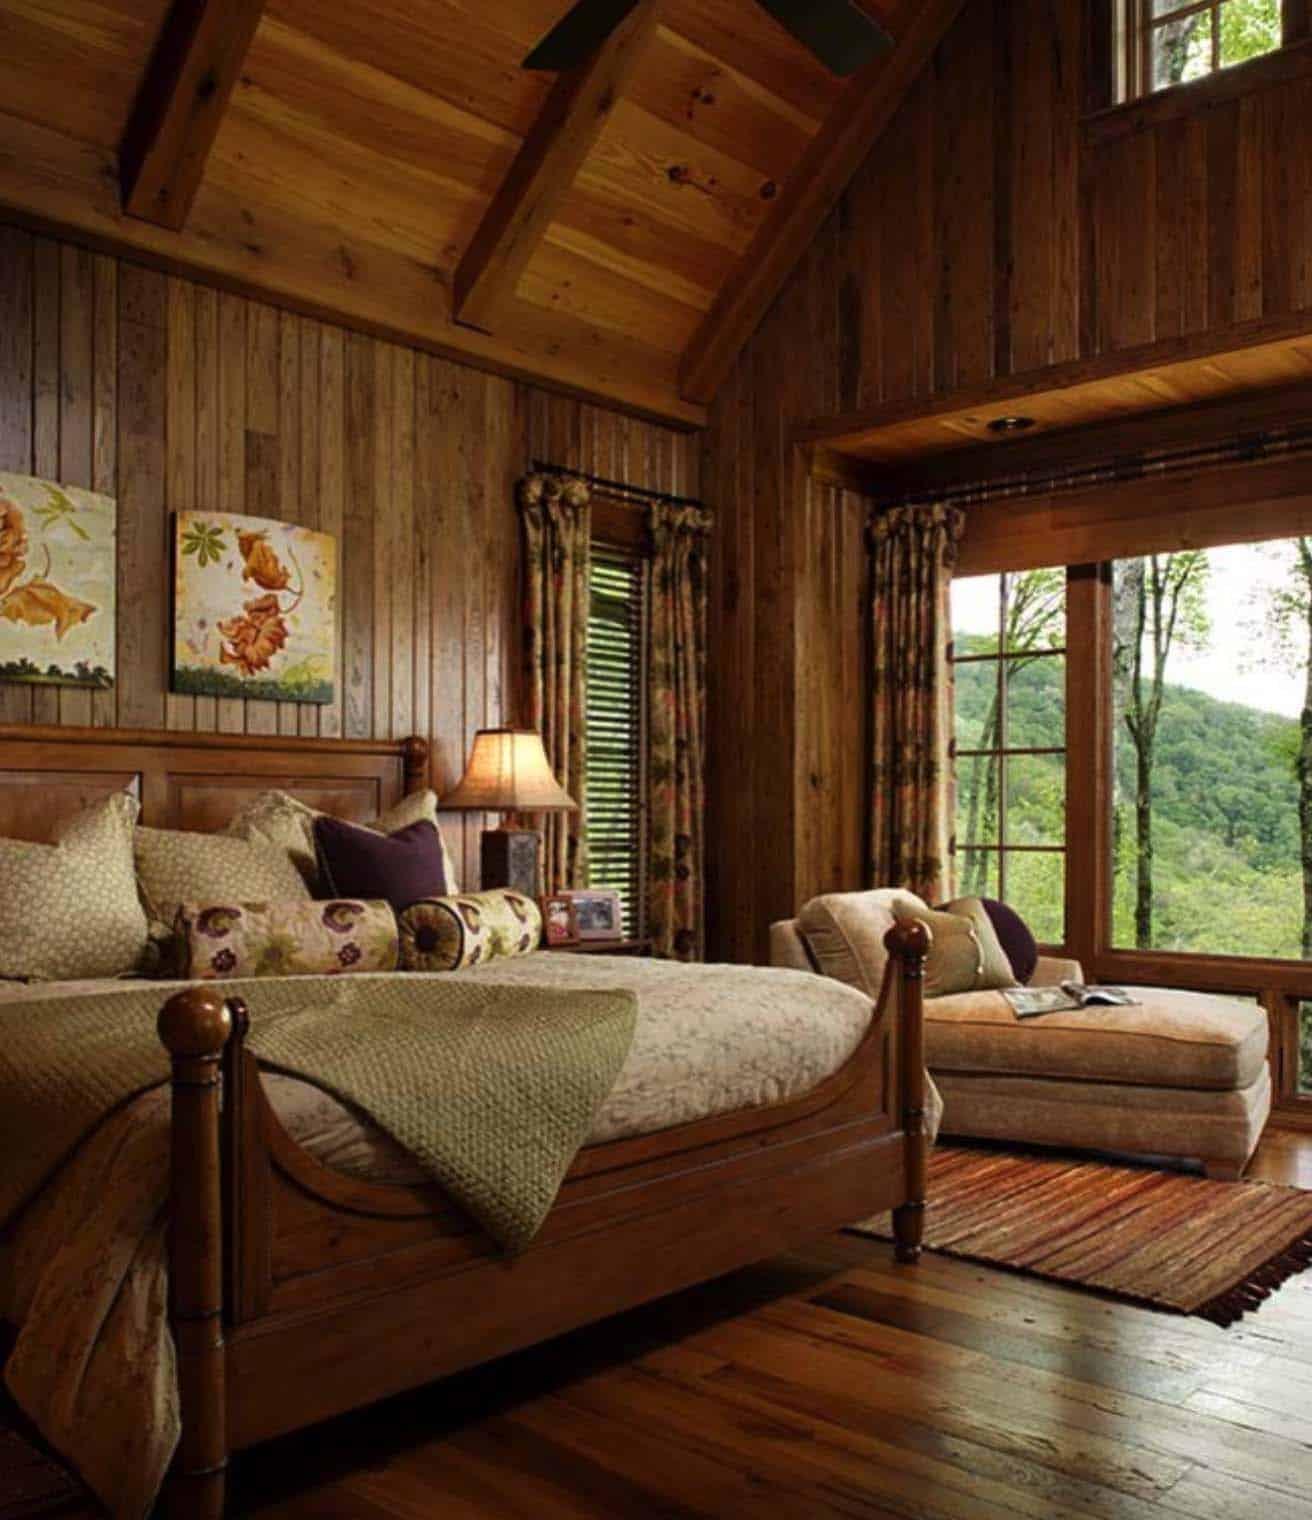 Timber Sky Retreat-Platt Architecture-06-1 Kindesign